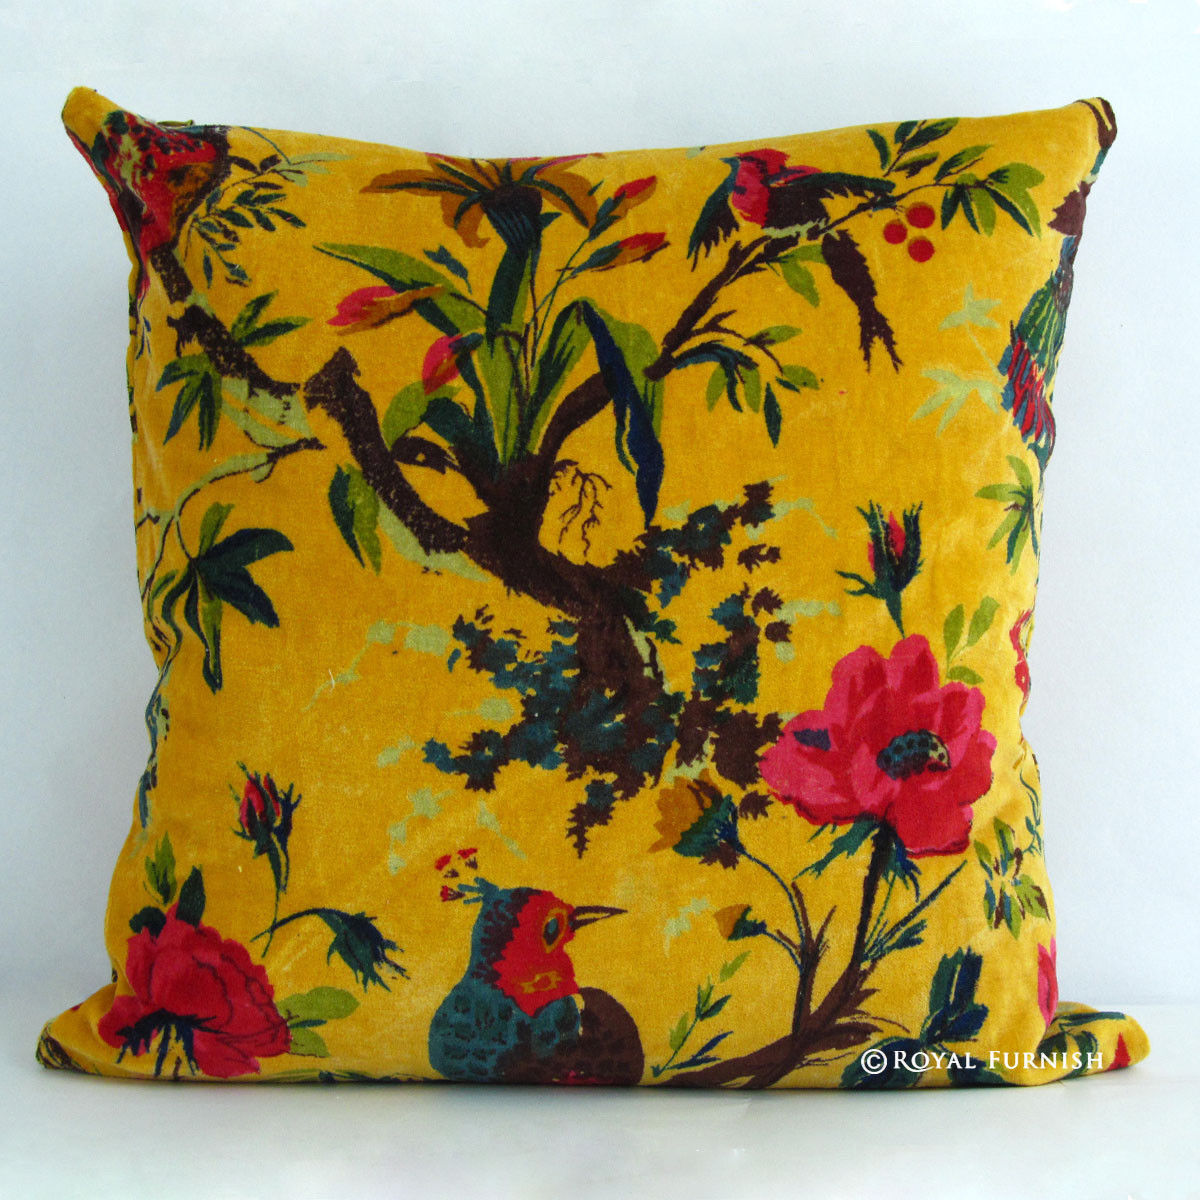 16x16 Orange Decorative Throw Accent Velvet Pillow Cover - RoyalFurnish.com